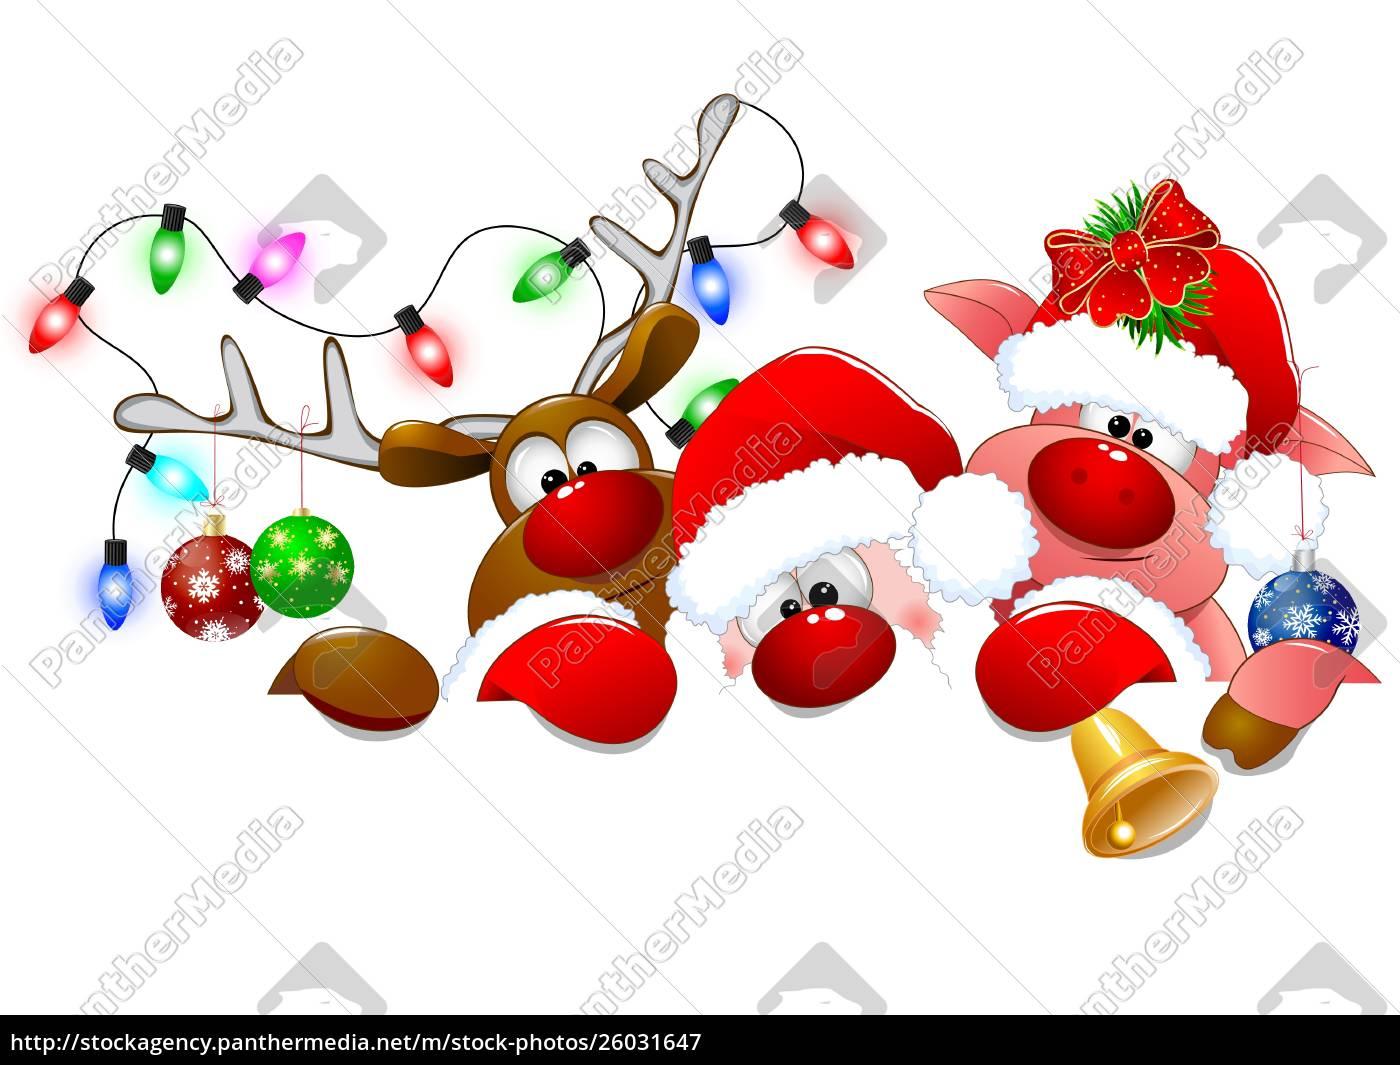 santa, claus, , deer, and, piglet, 1 - 26031647